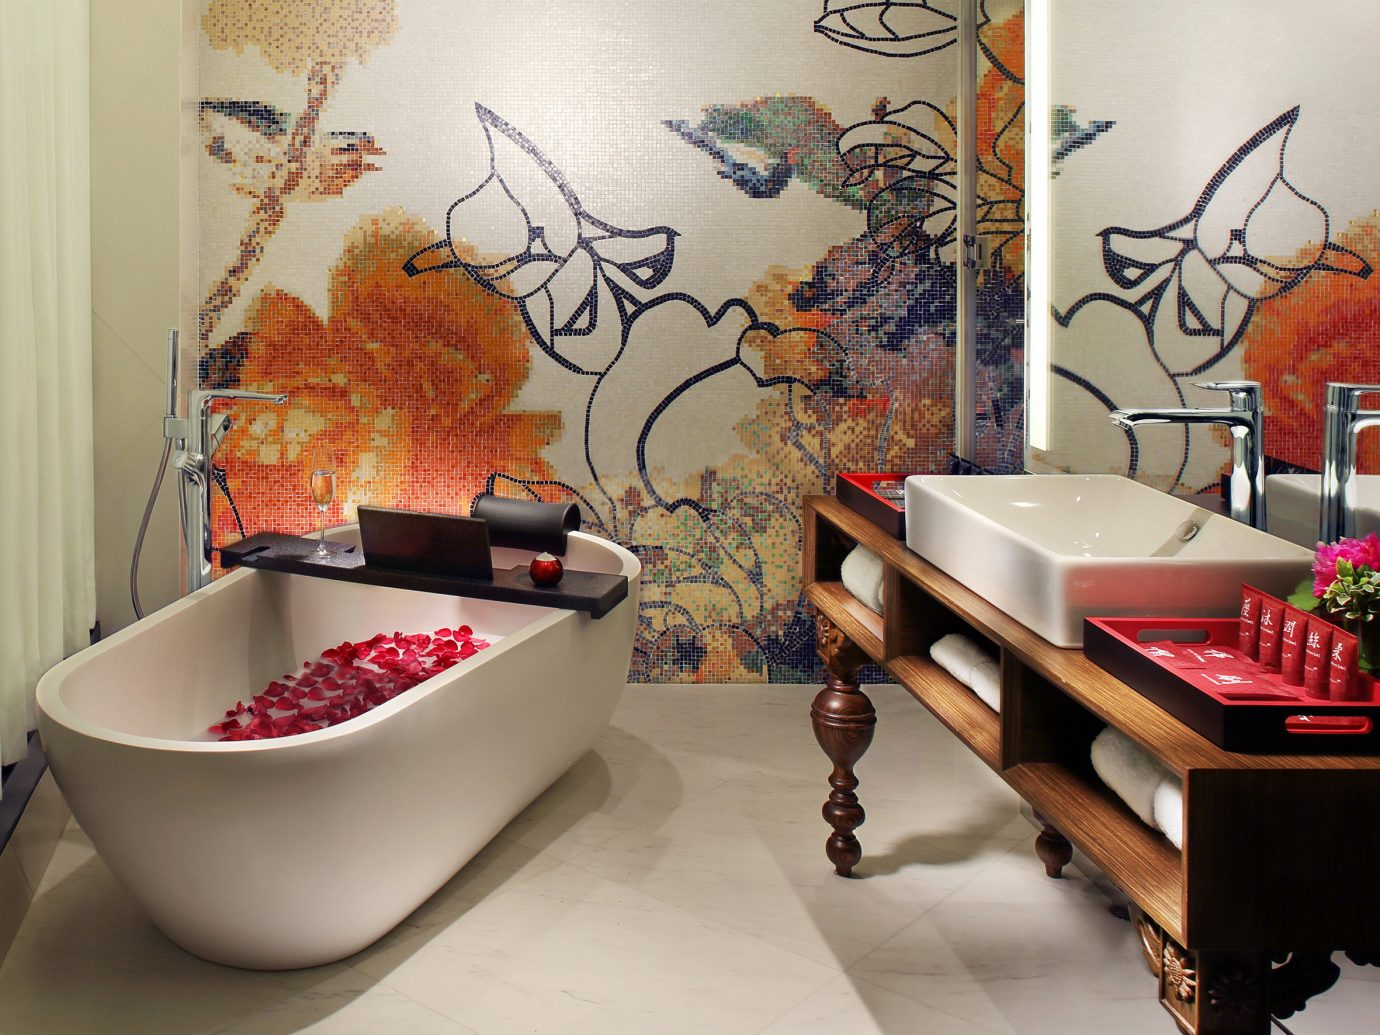 Hotels indoor wall room red floor interior design flooring Design bathroom decorated furniture